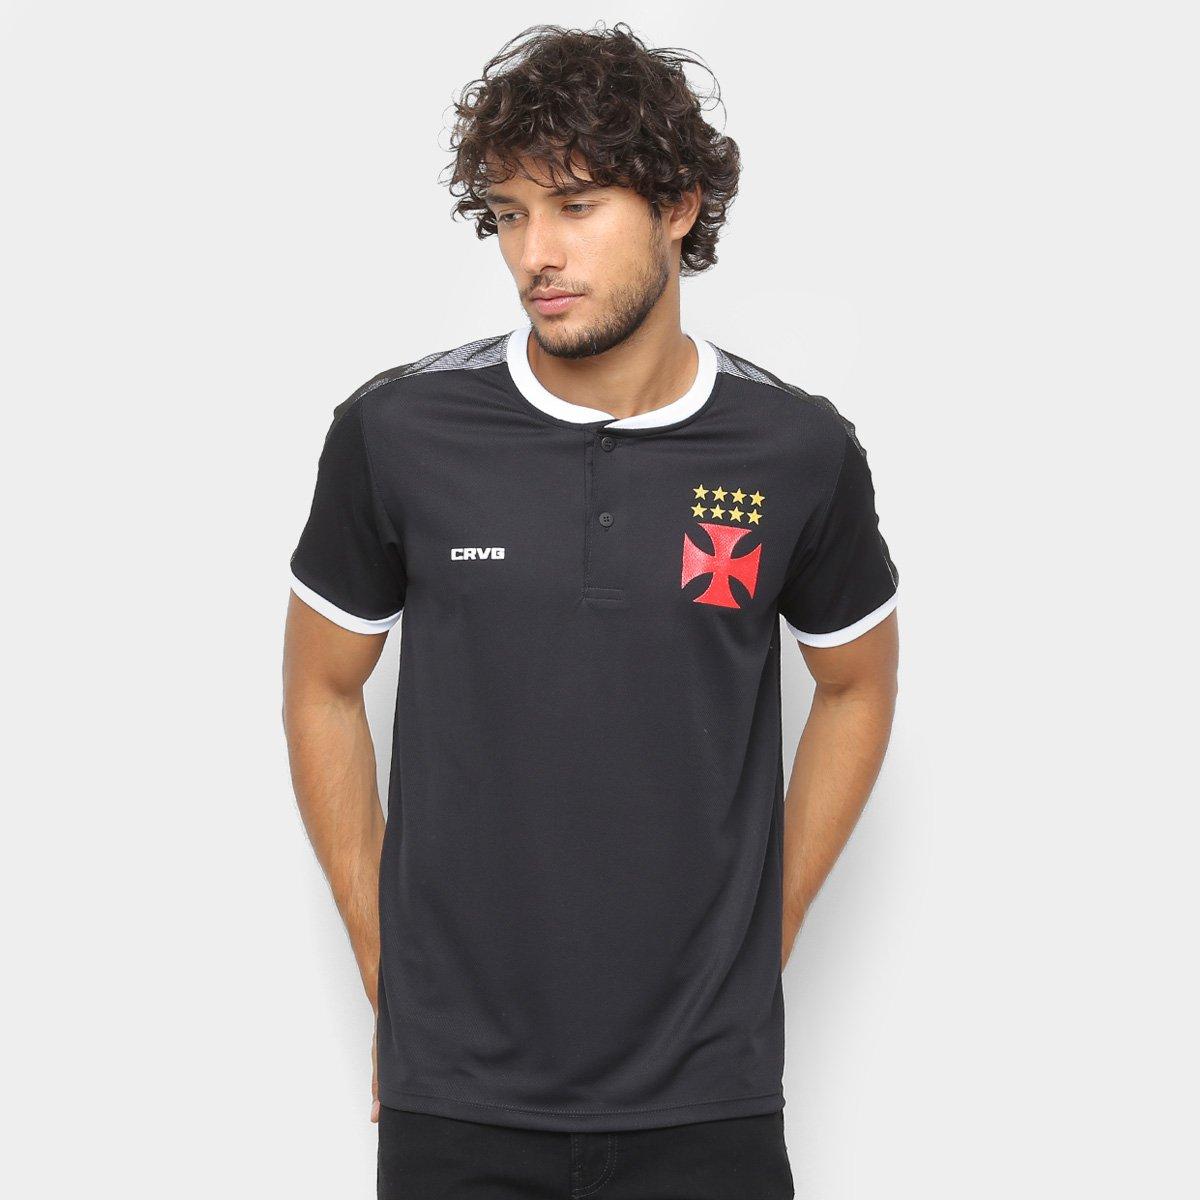 0845d709e3 Camisa Polo Vasco Squad Masculina - Preto e Branco